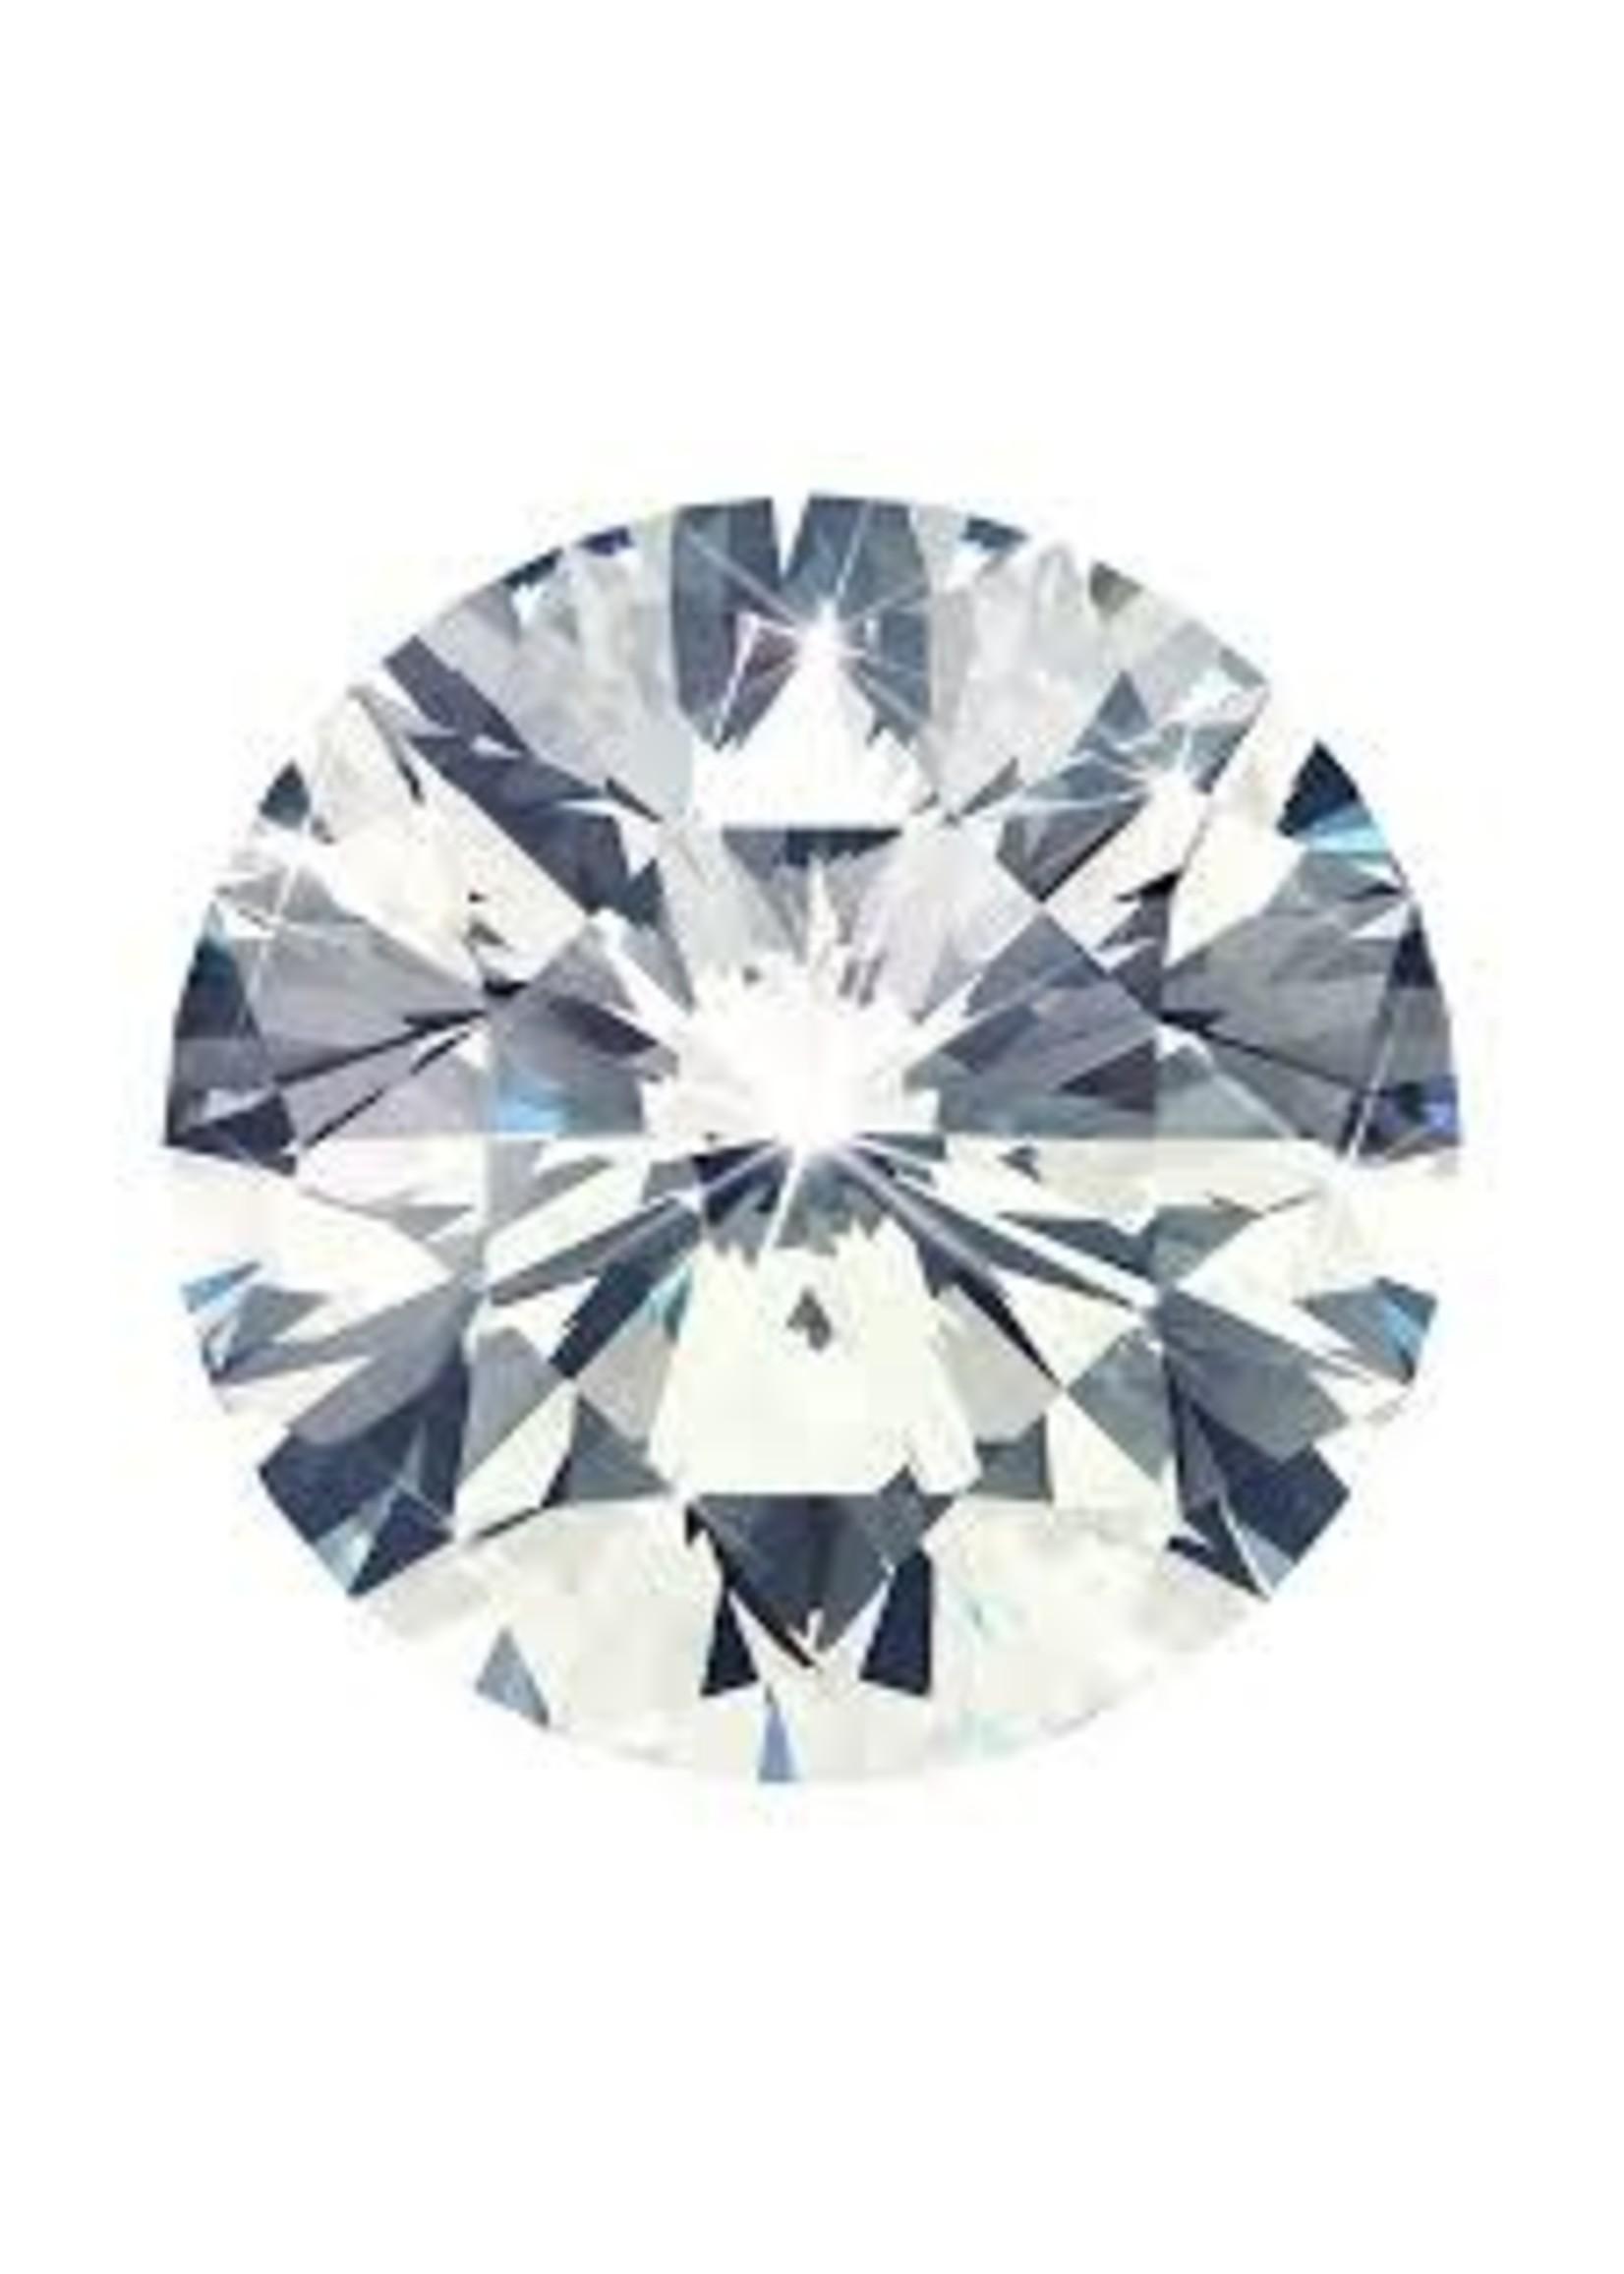 1.01CT ROUND BRILLIANT CUT DIAMOND (SI-2/G/VERY GOOD)